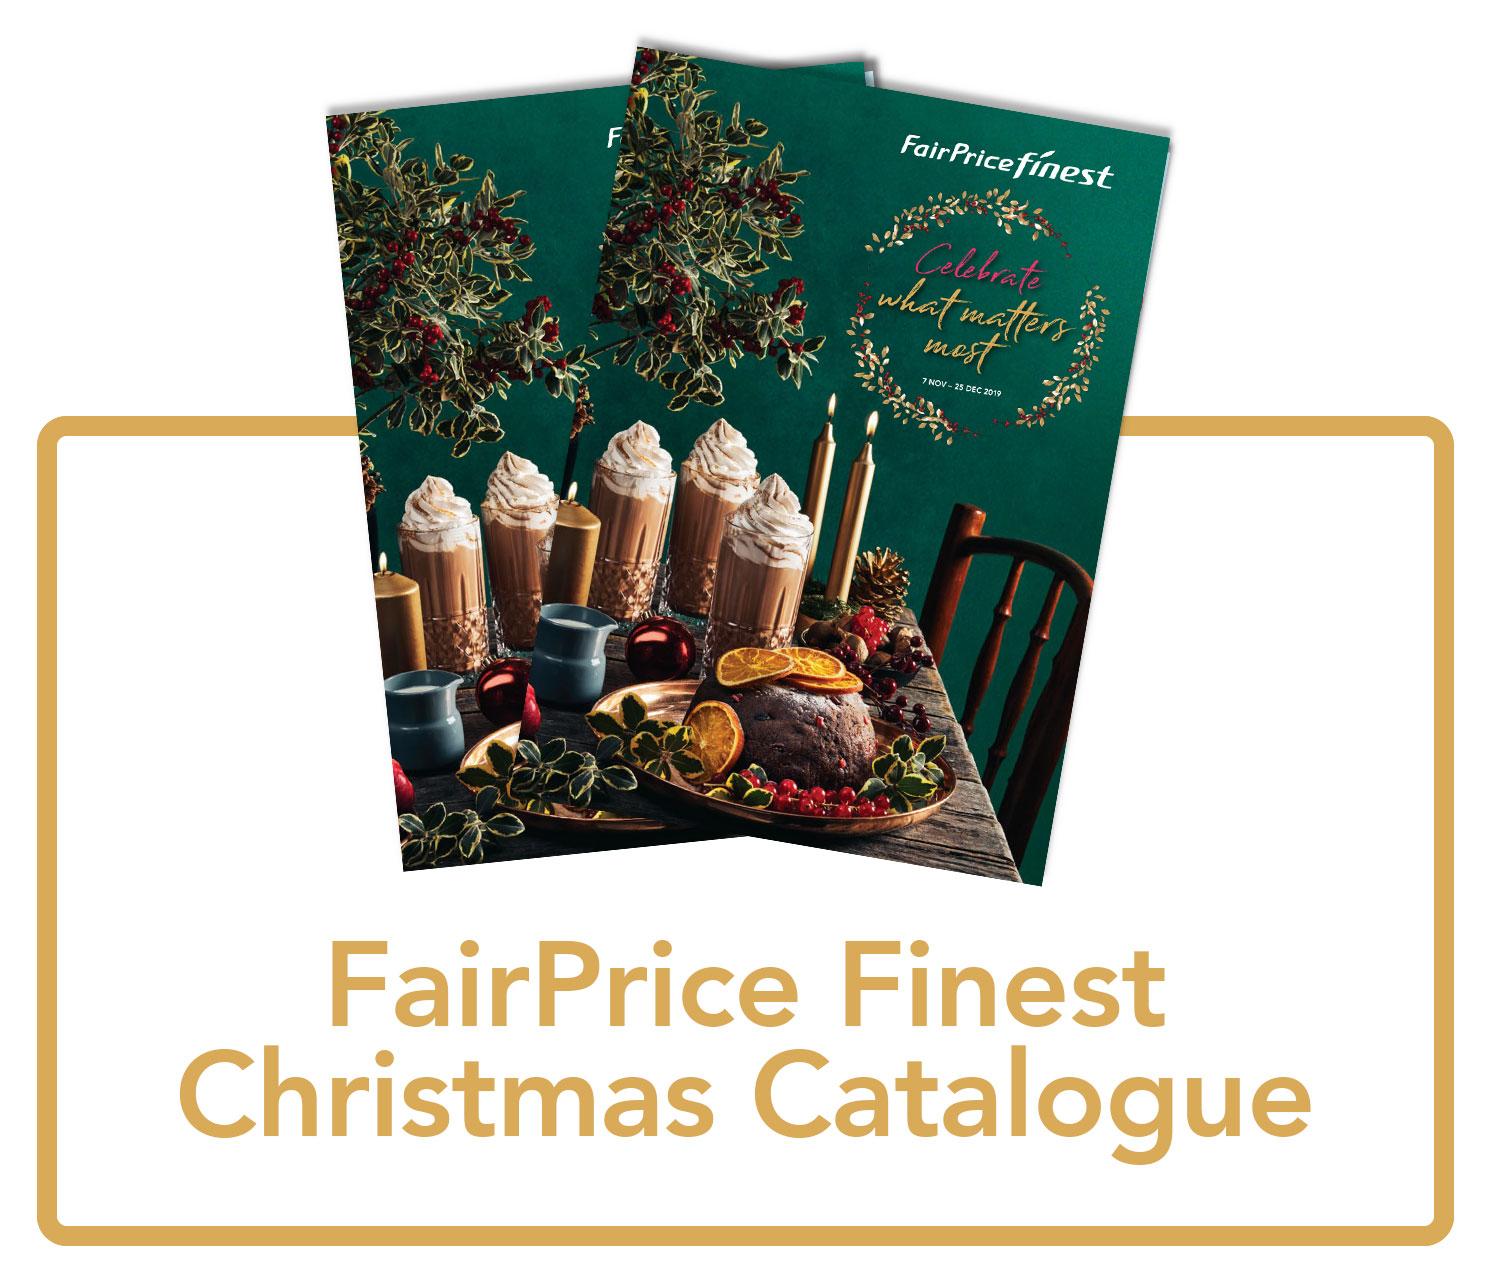 FairPrice Finest Christmas catalogue